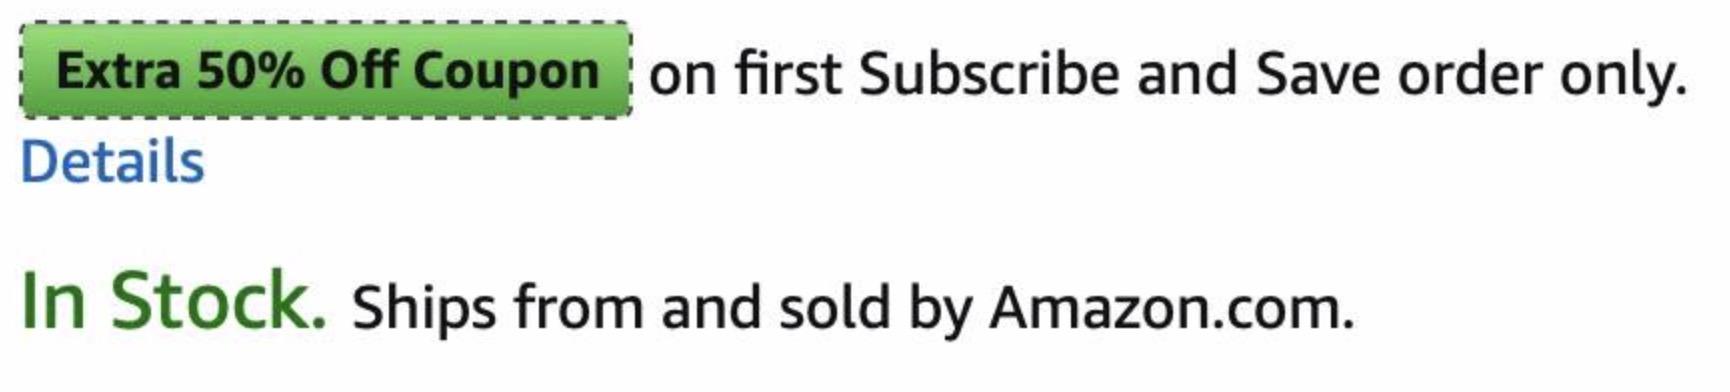 50% off coupon on Amazon